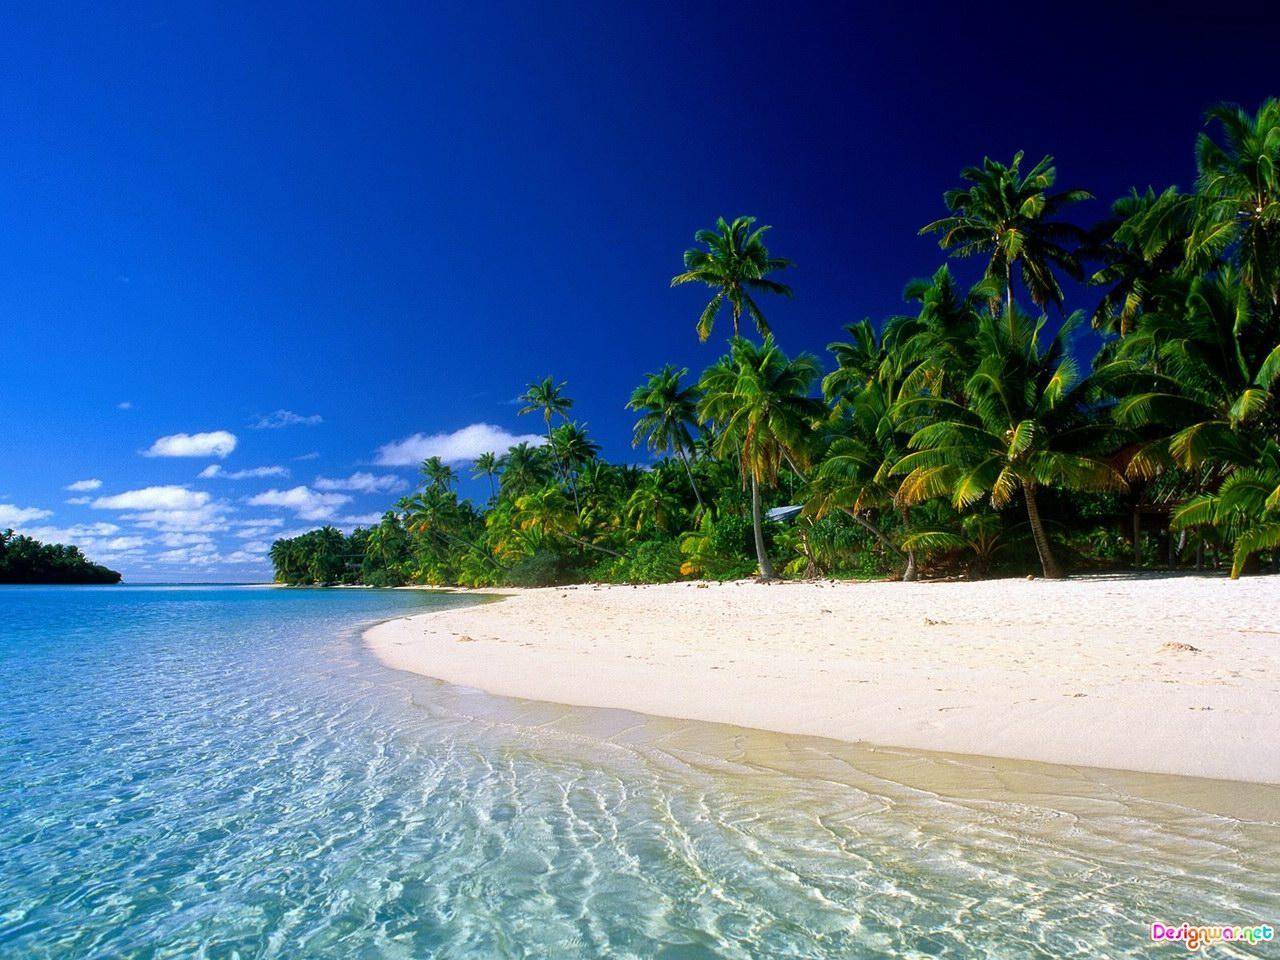 http://3.bp.blogspot.com/-tFmKcy67MHE/Tmd5TMnA_pI/AAAAAAAAFf8/Mh1EQ6NOiEY/s1600/Tropical+beach+wallpaper1.jpg